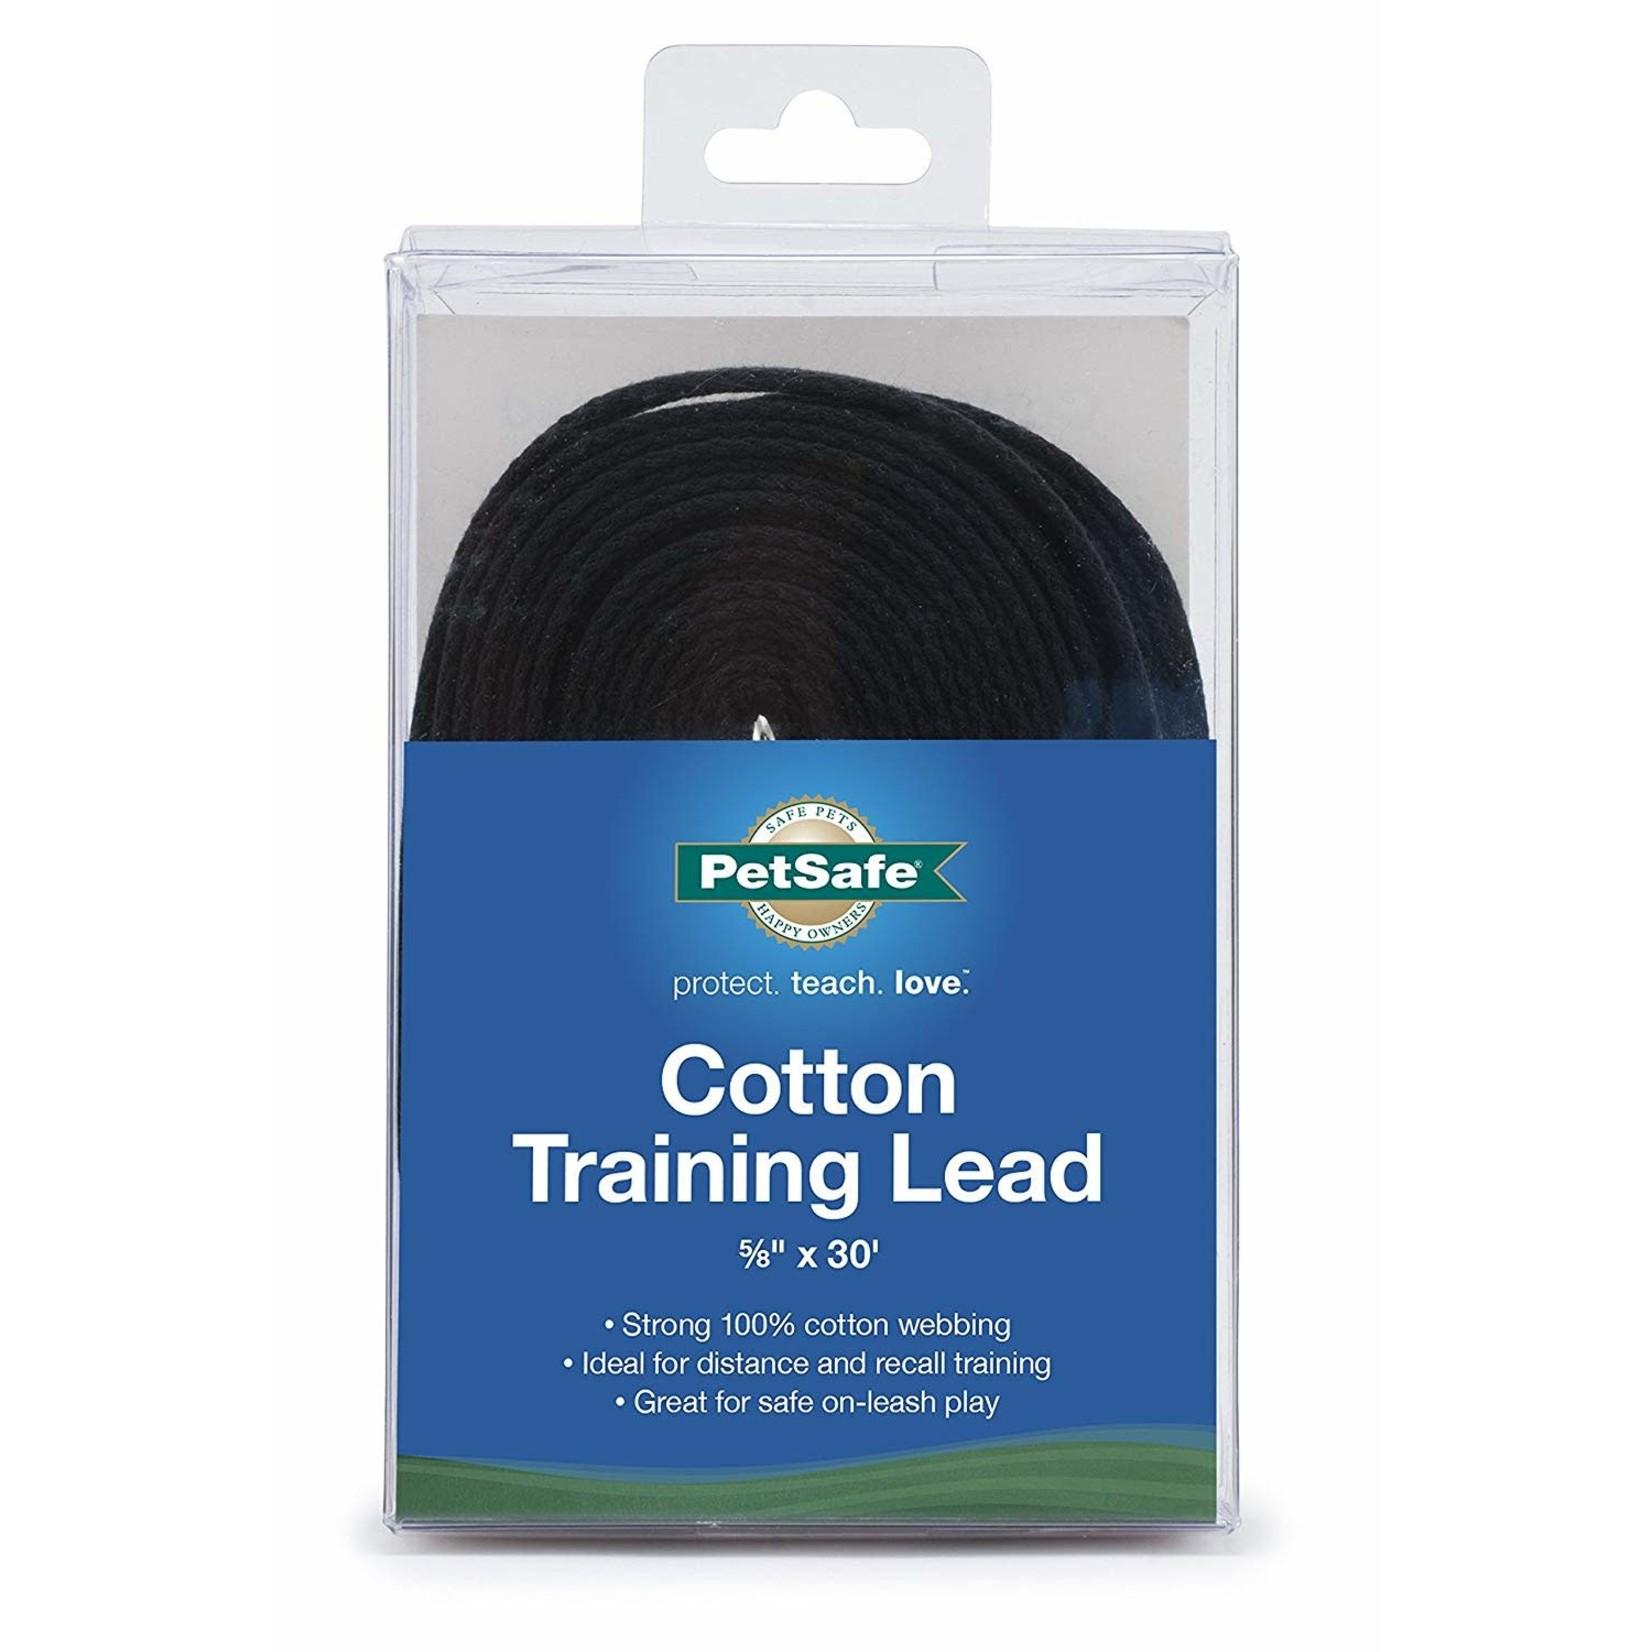 "Petsafe PETSAFE Cotton Training Lead 5/8"" x 30'"